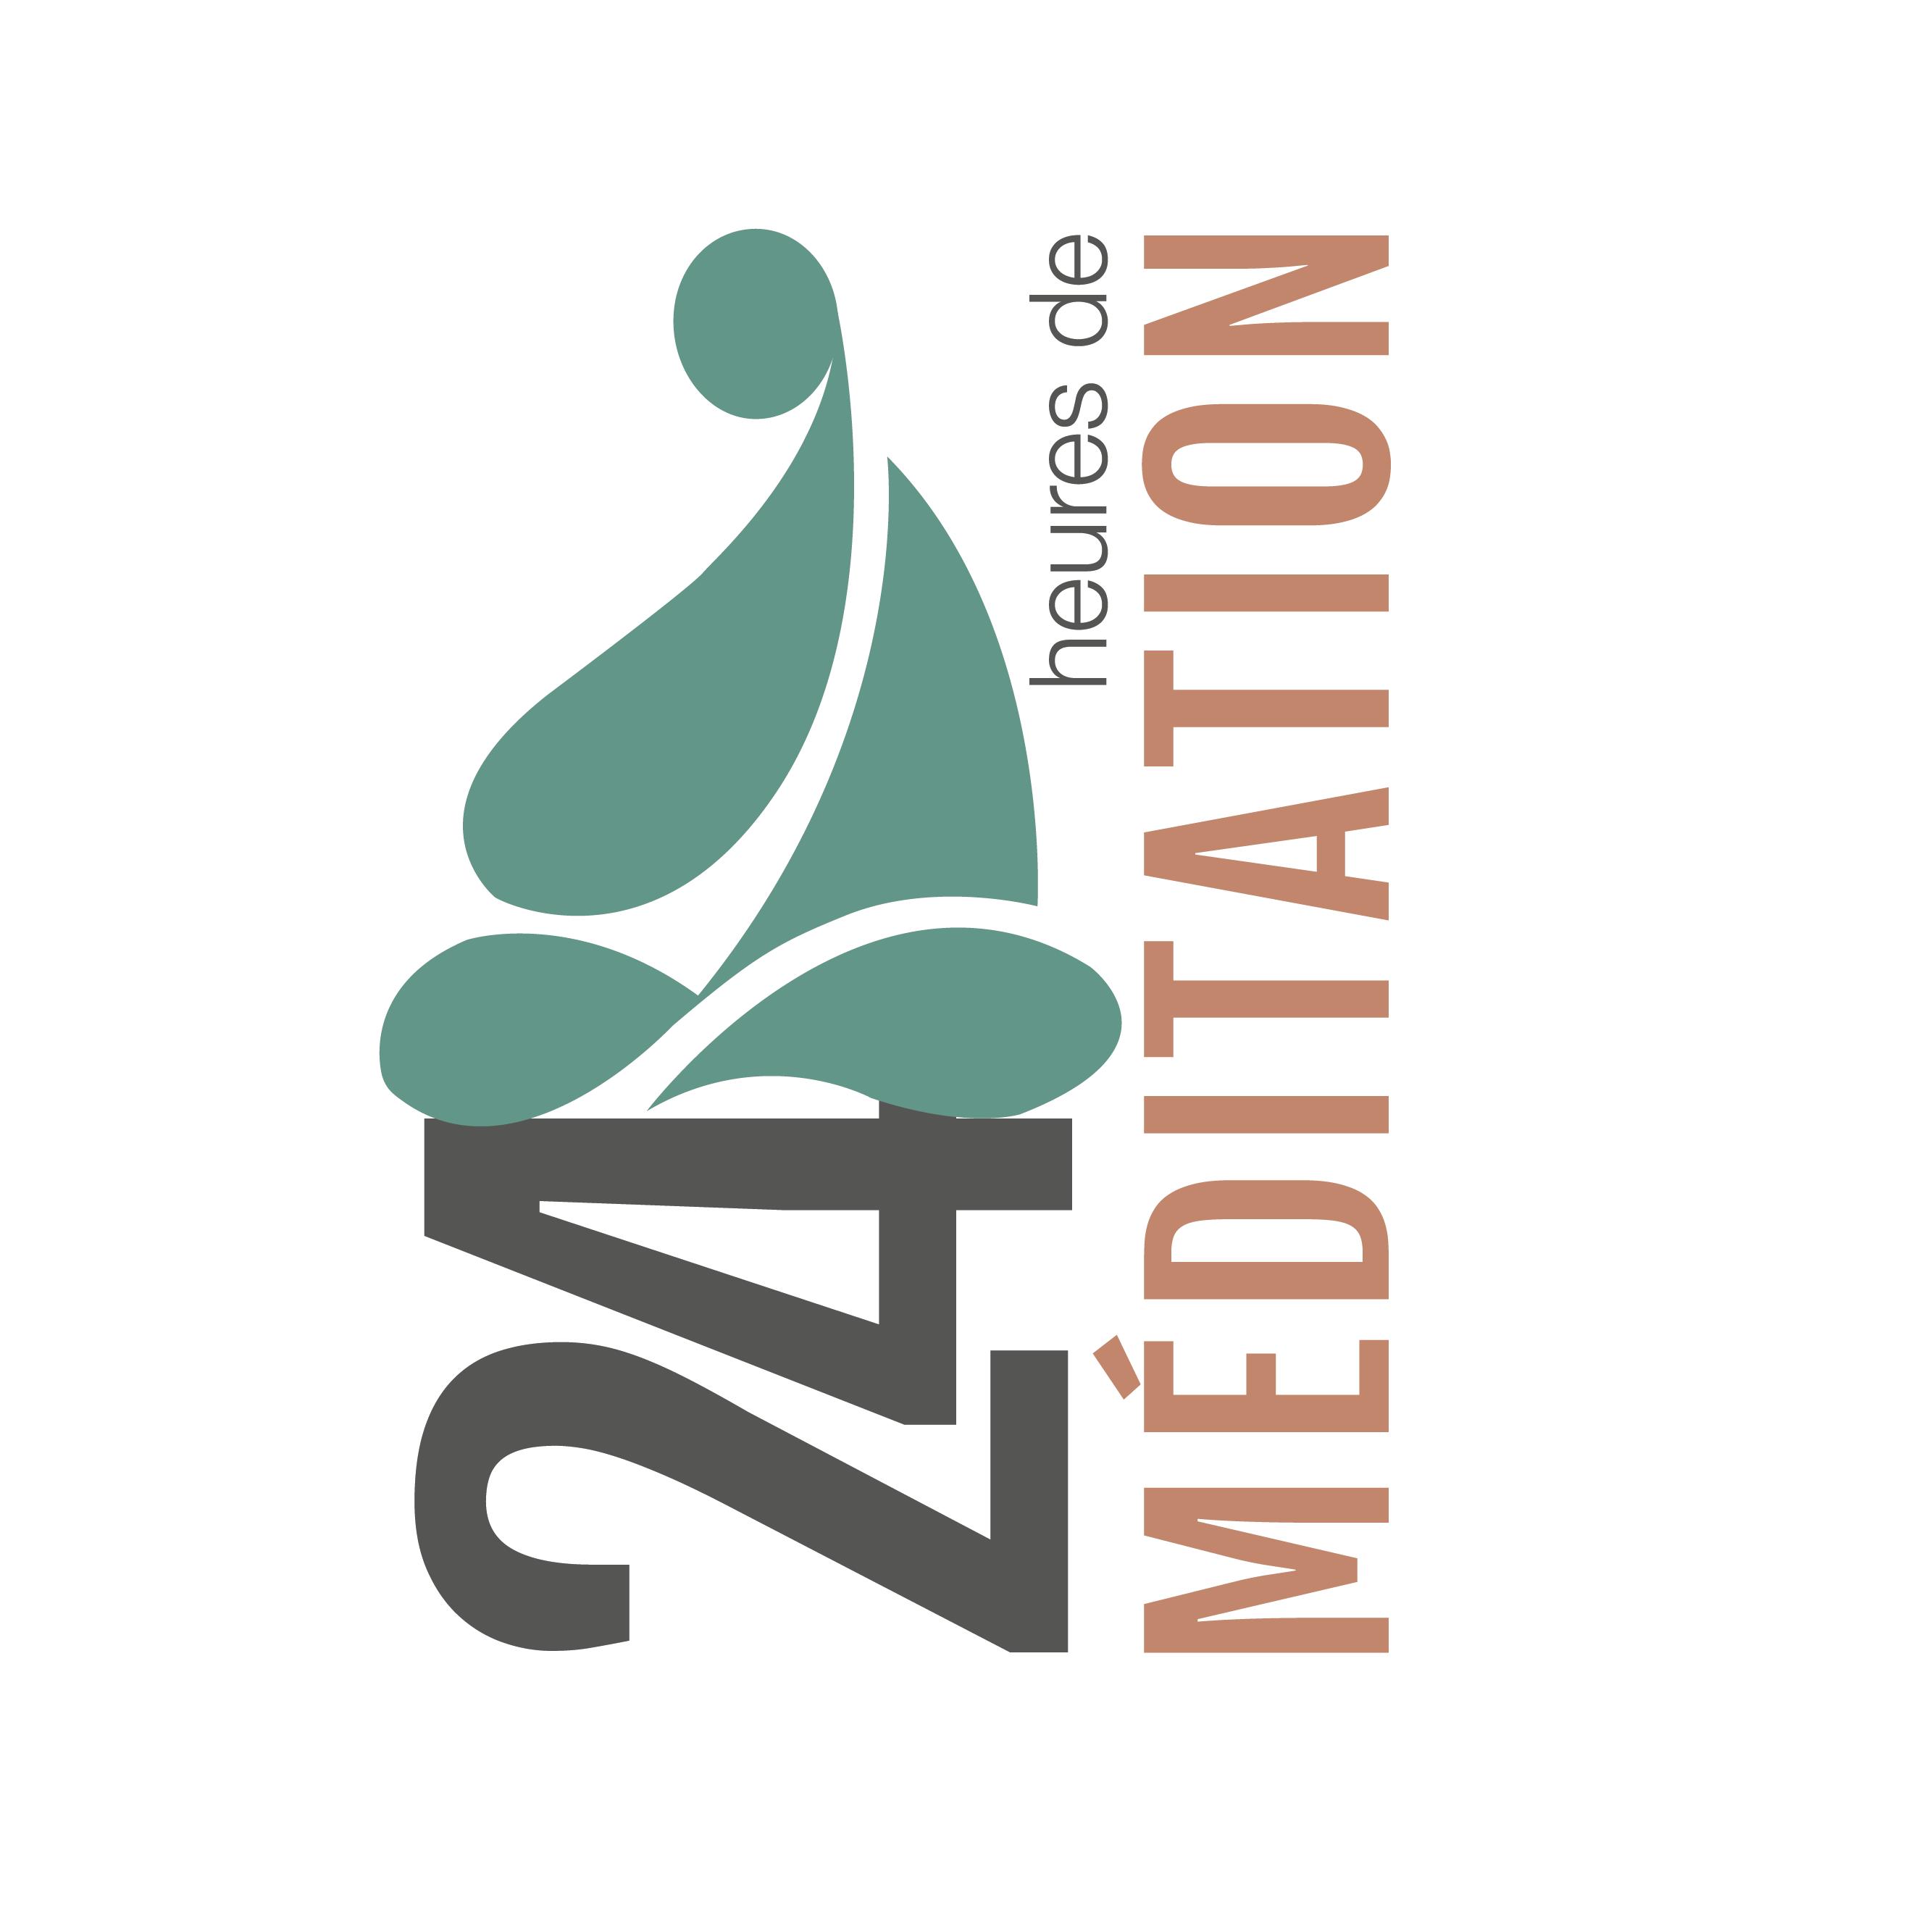 24 HEURES DE MÉDITATION